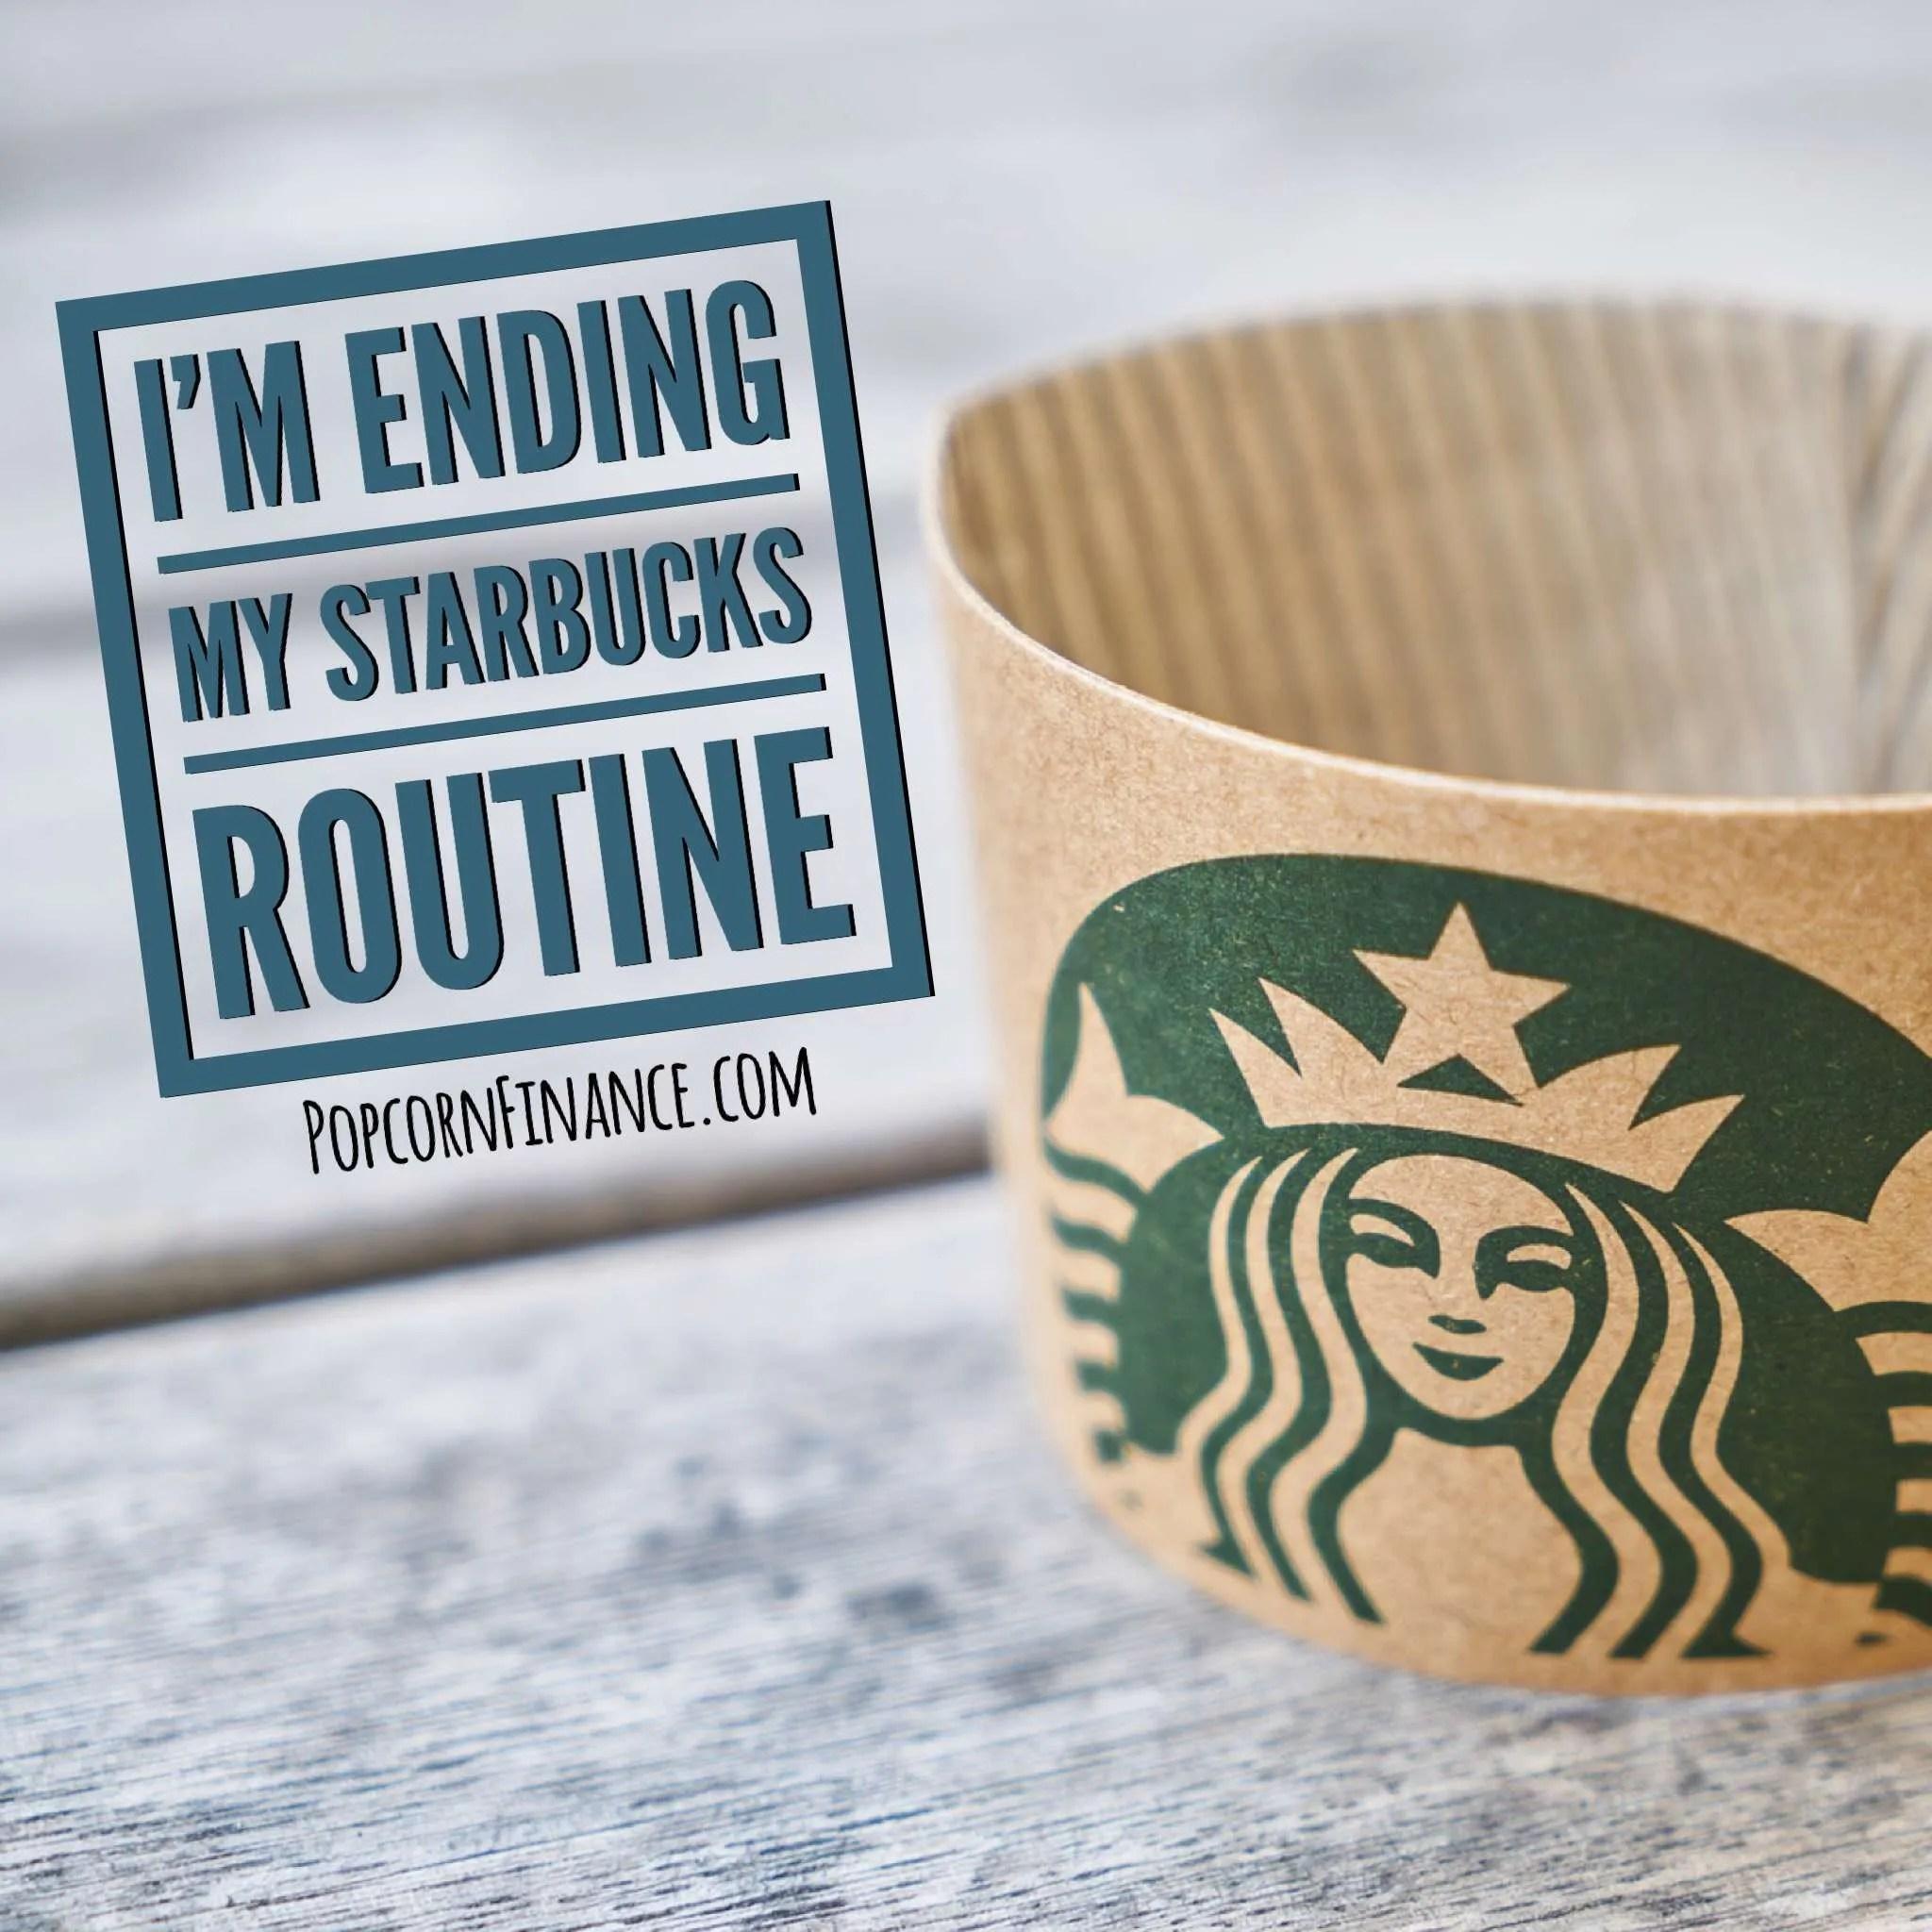 I Ended My Starbucks Routine > Popcorn Finance